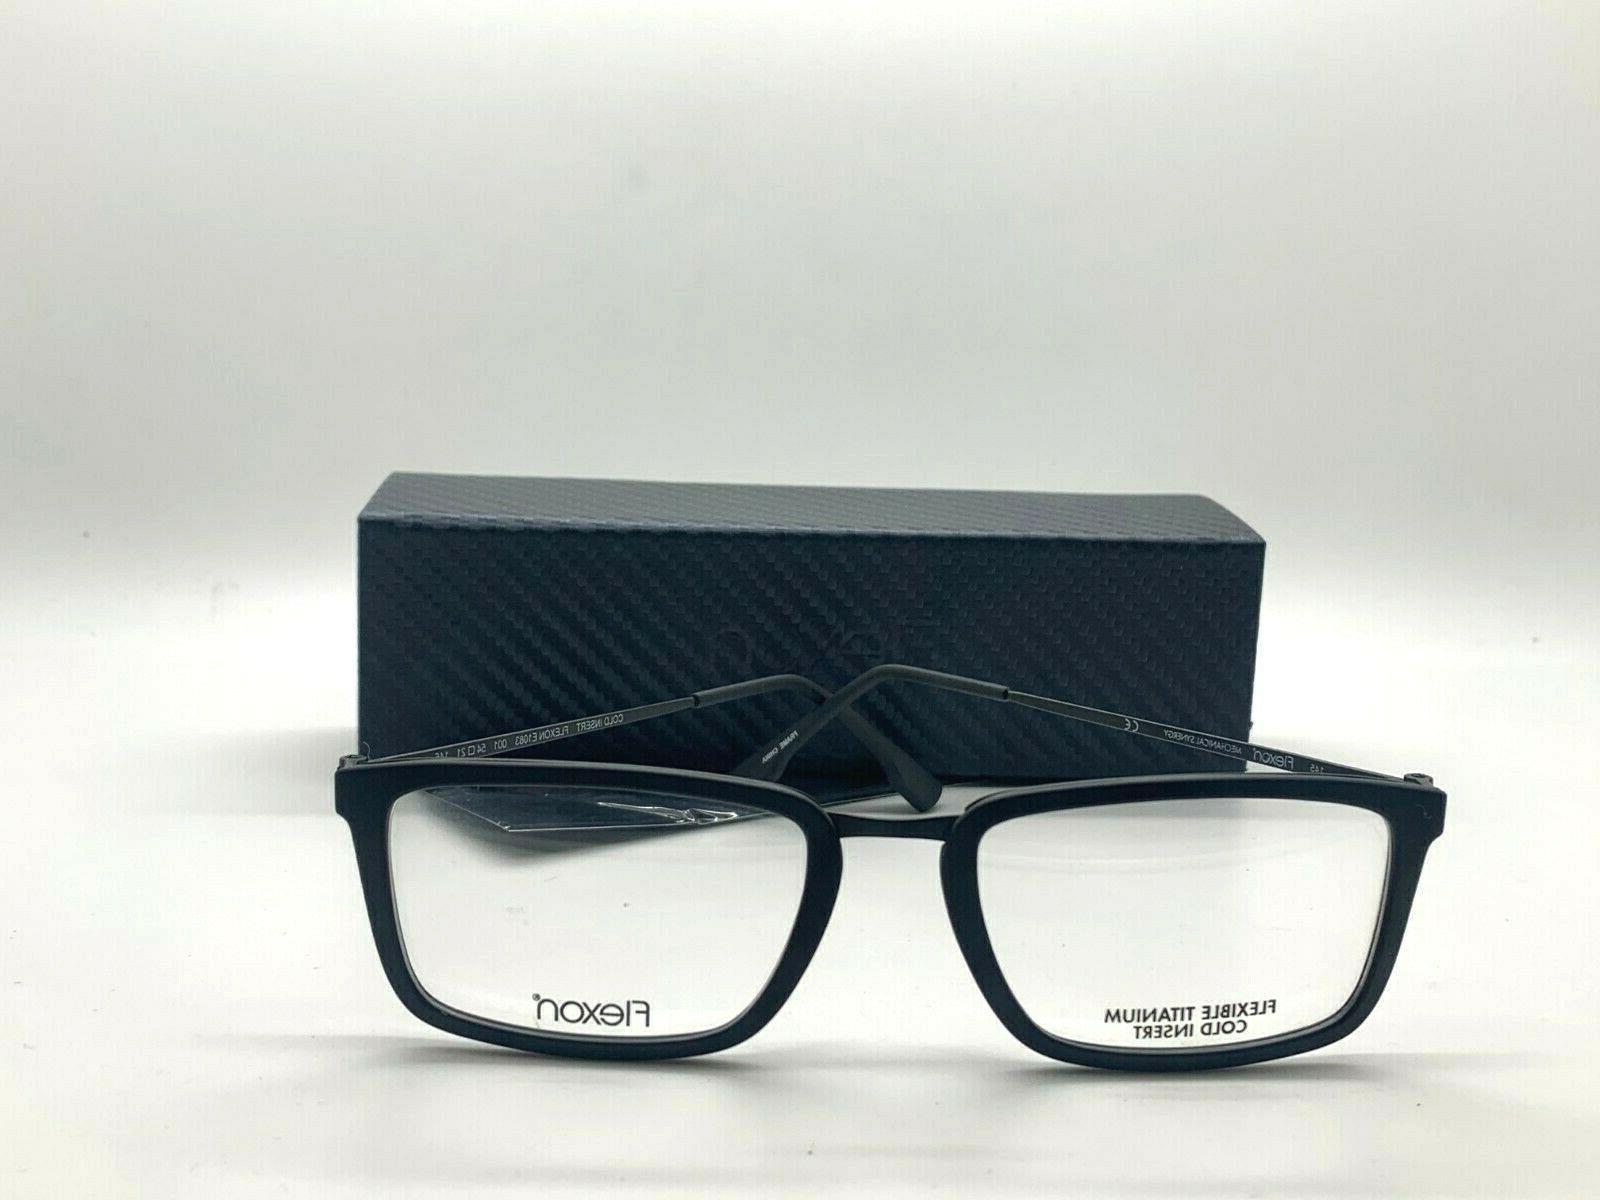 NEW FLEXON 001 INSERT Eyeglasses